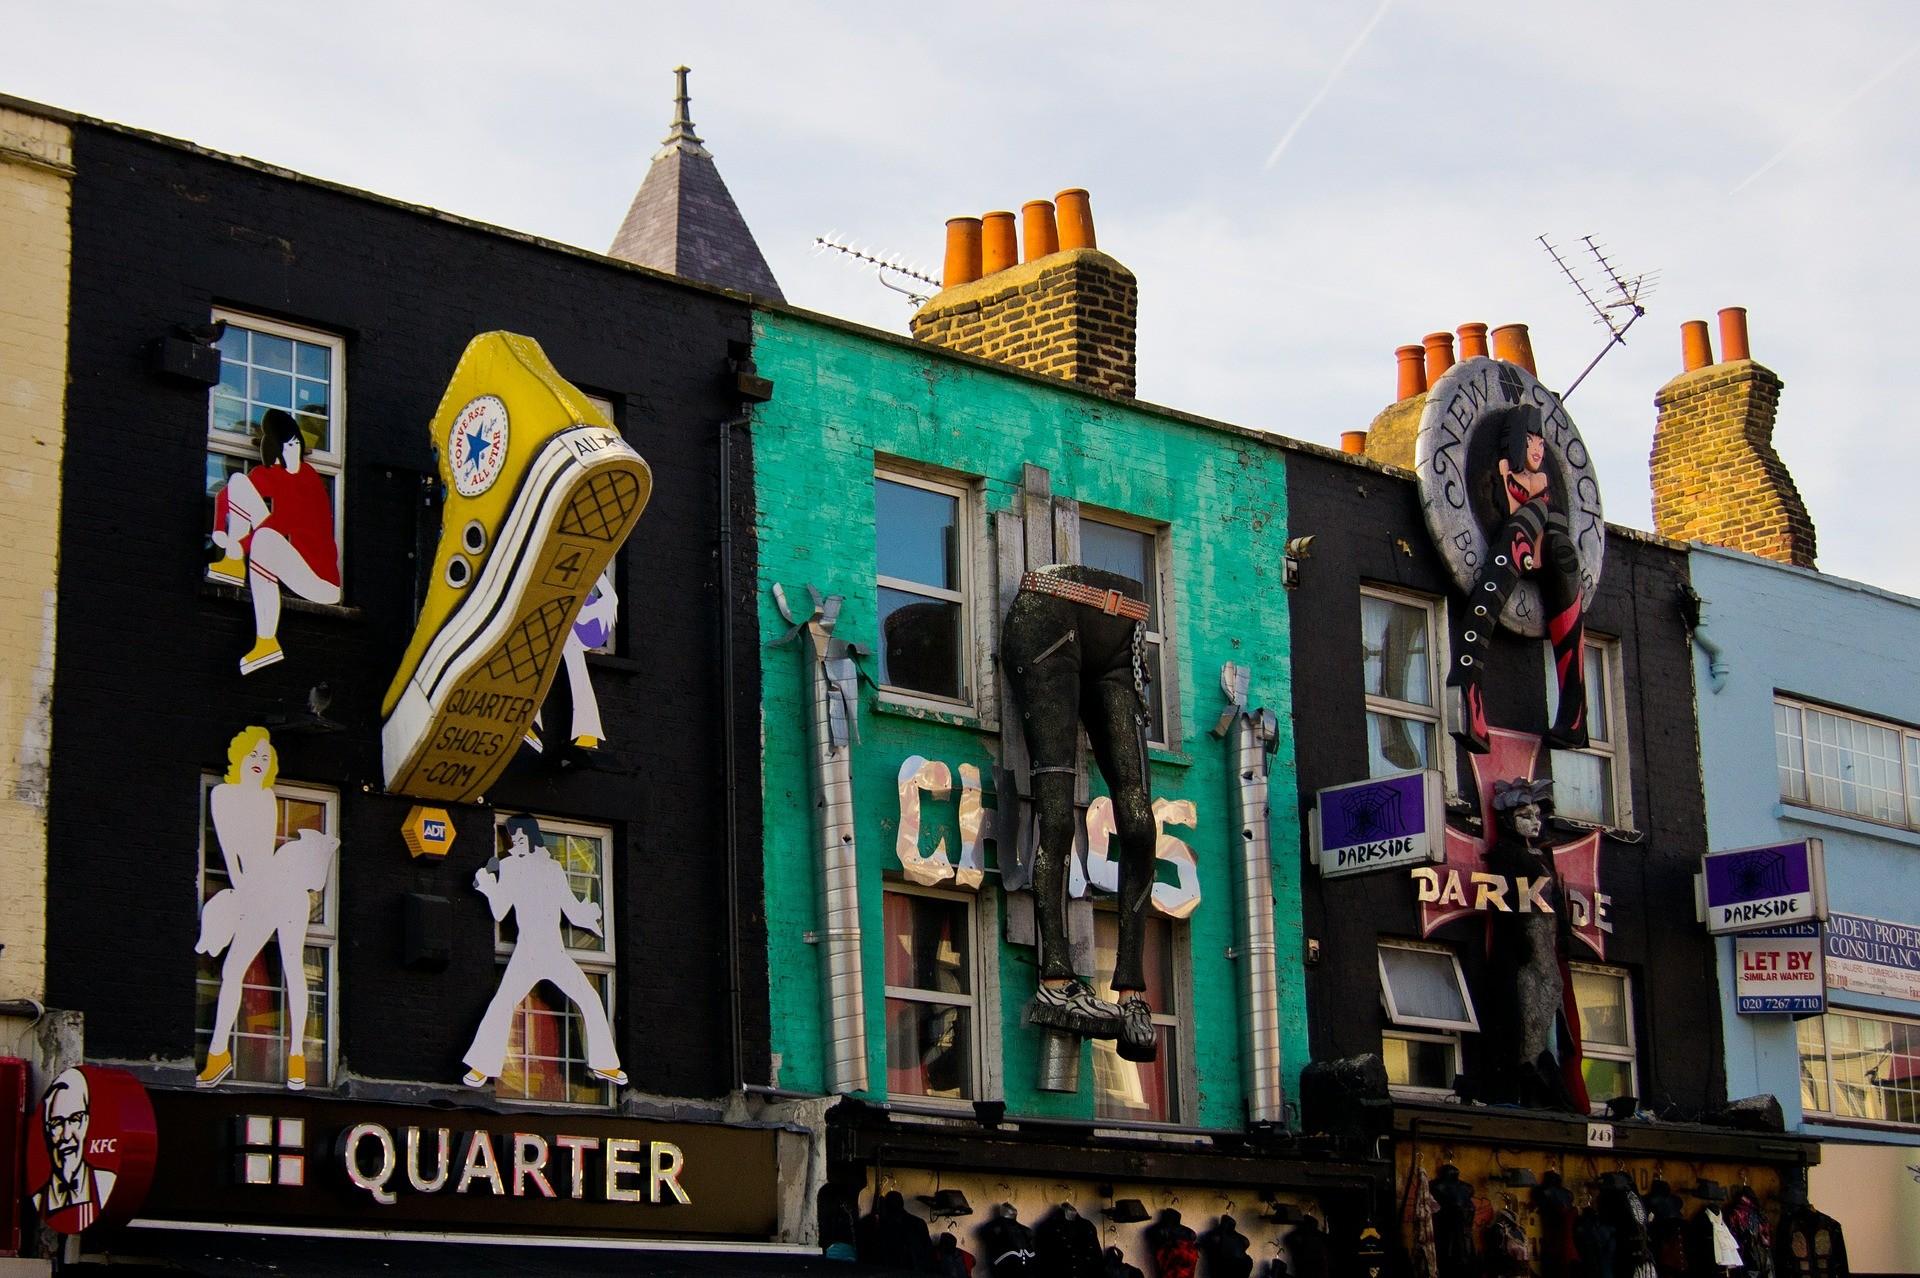 Camden Market, London: All year